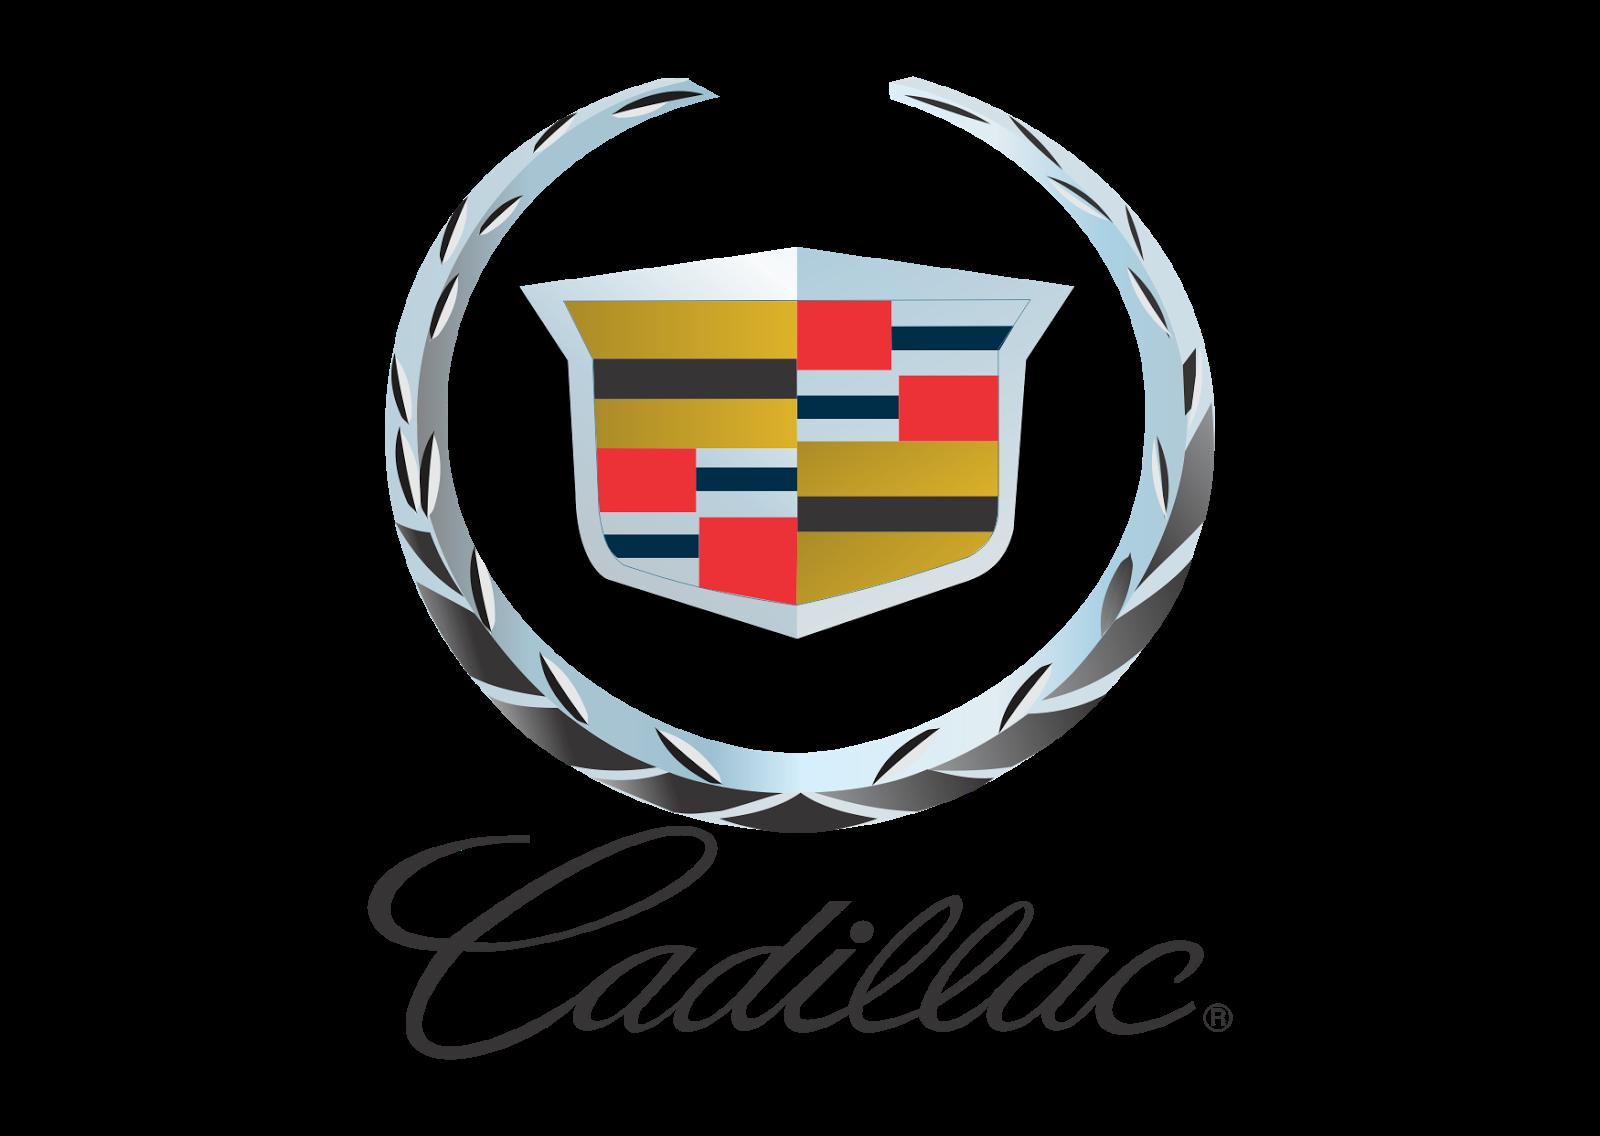 Cadillac logo 2015